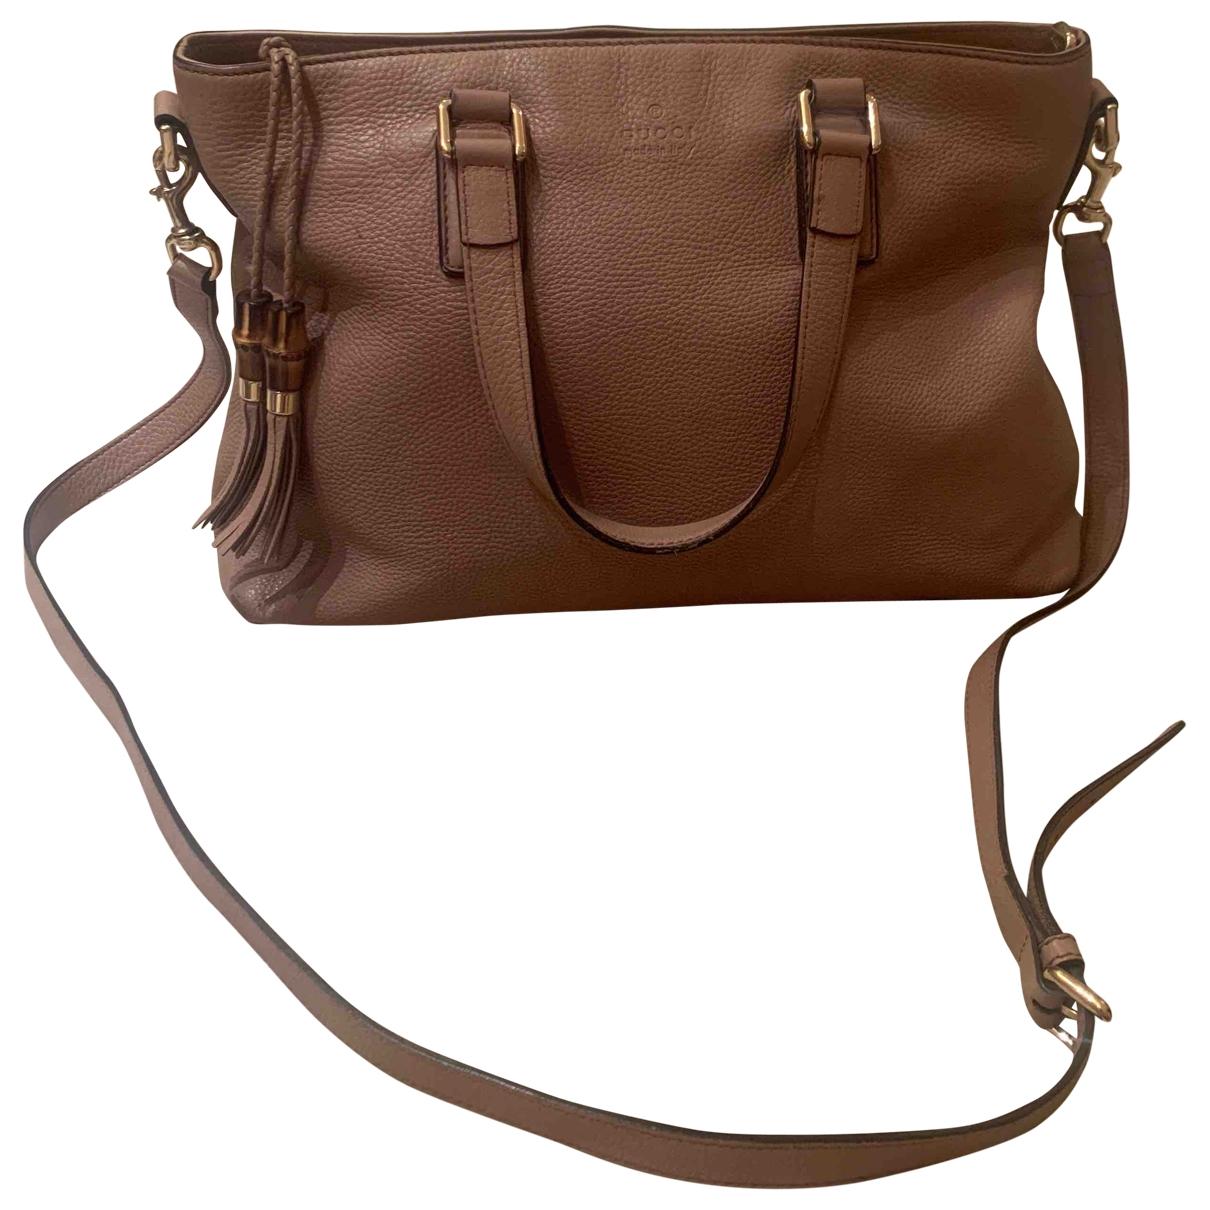 Gucci \N Pink Leather handbag for Women \N